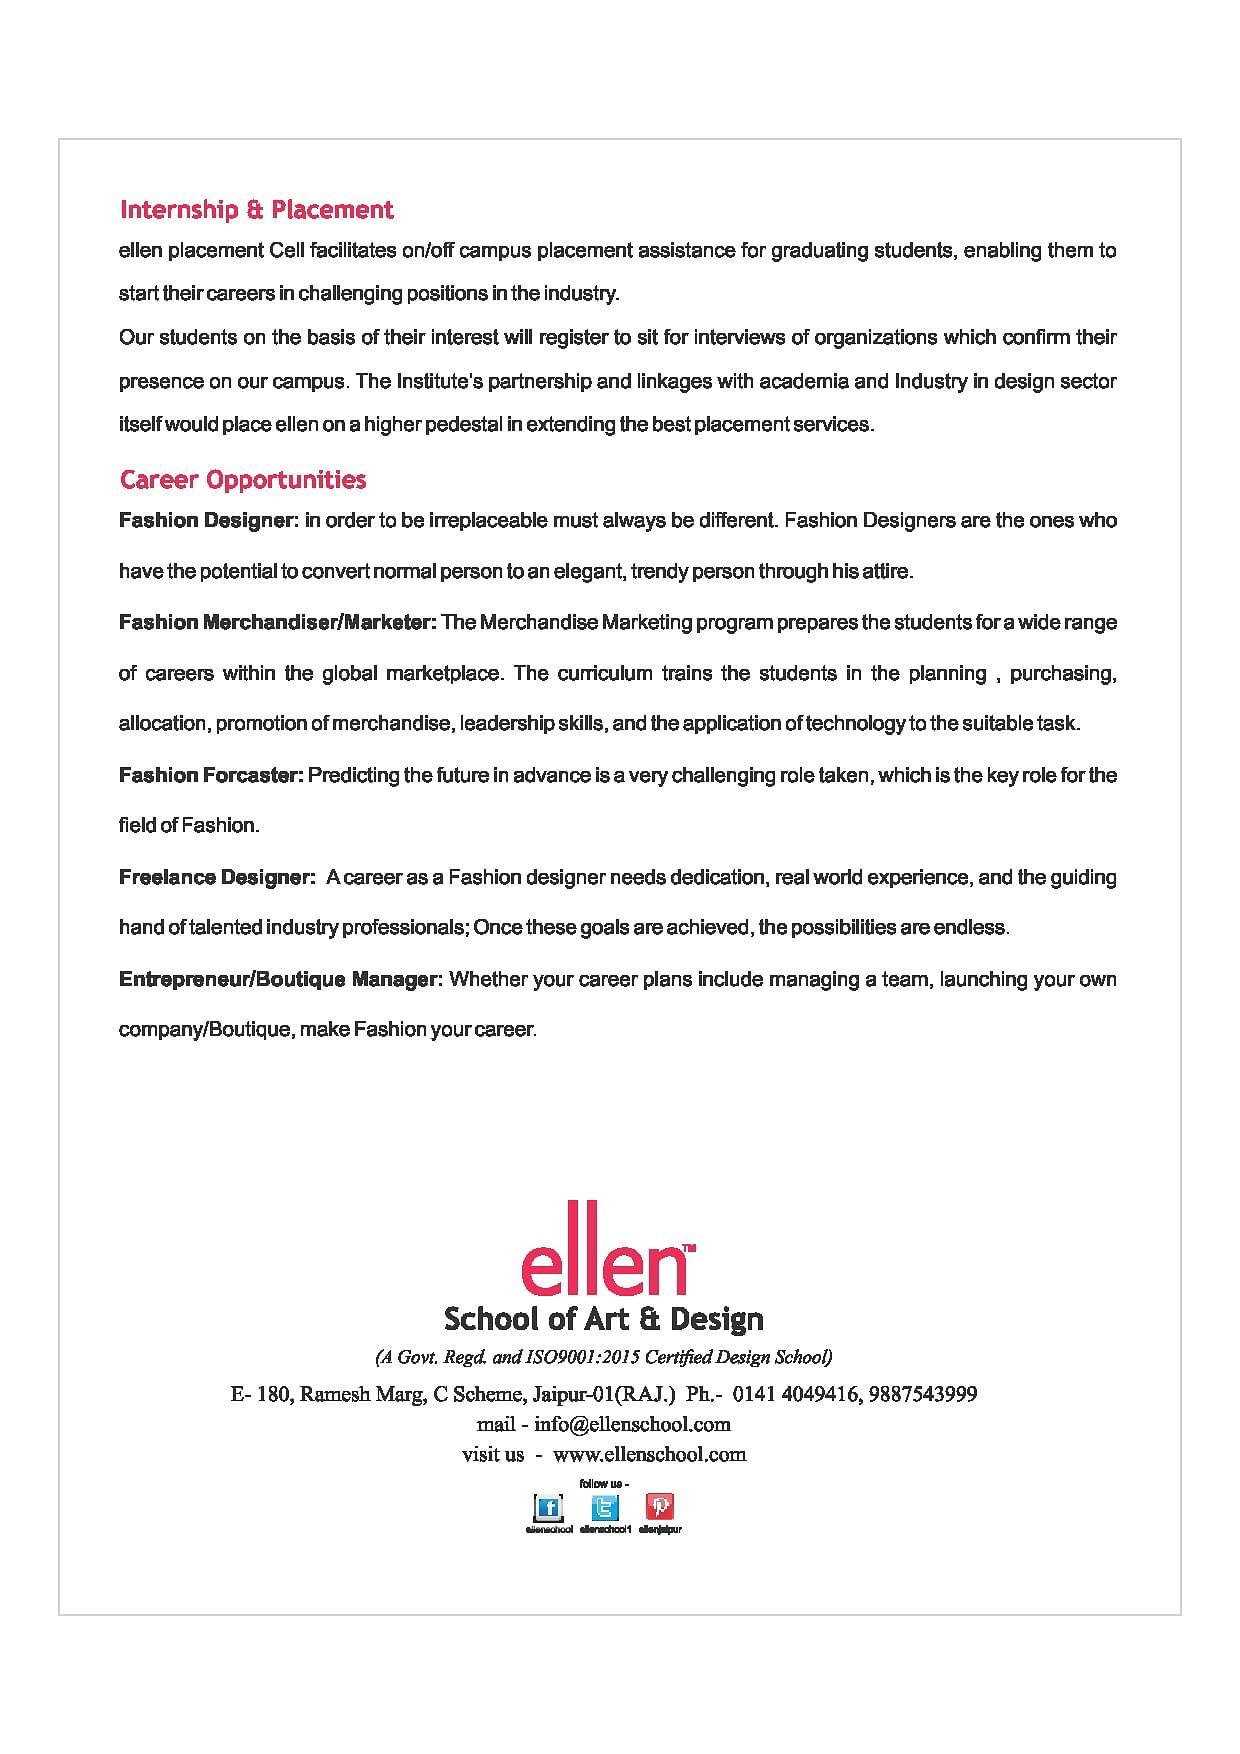 Ellen School Of Art Design Jaipur Admissions Contact Website Facilities 2020 2021